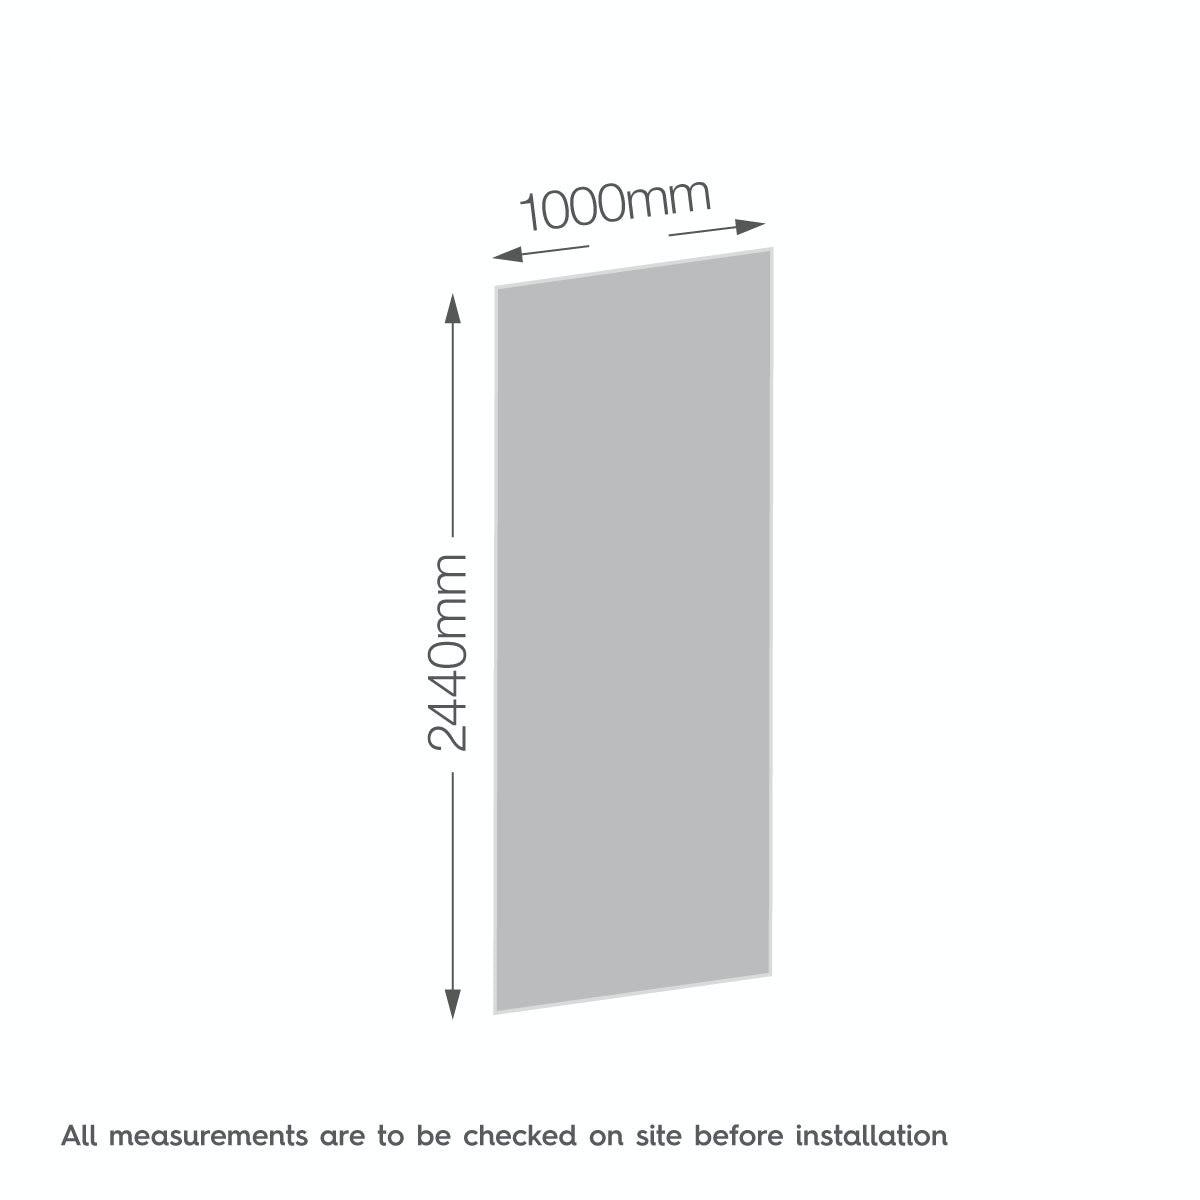 Dimensions for Zenolite plus earth acrylic shower wall panel 2440 x 1000